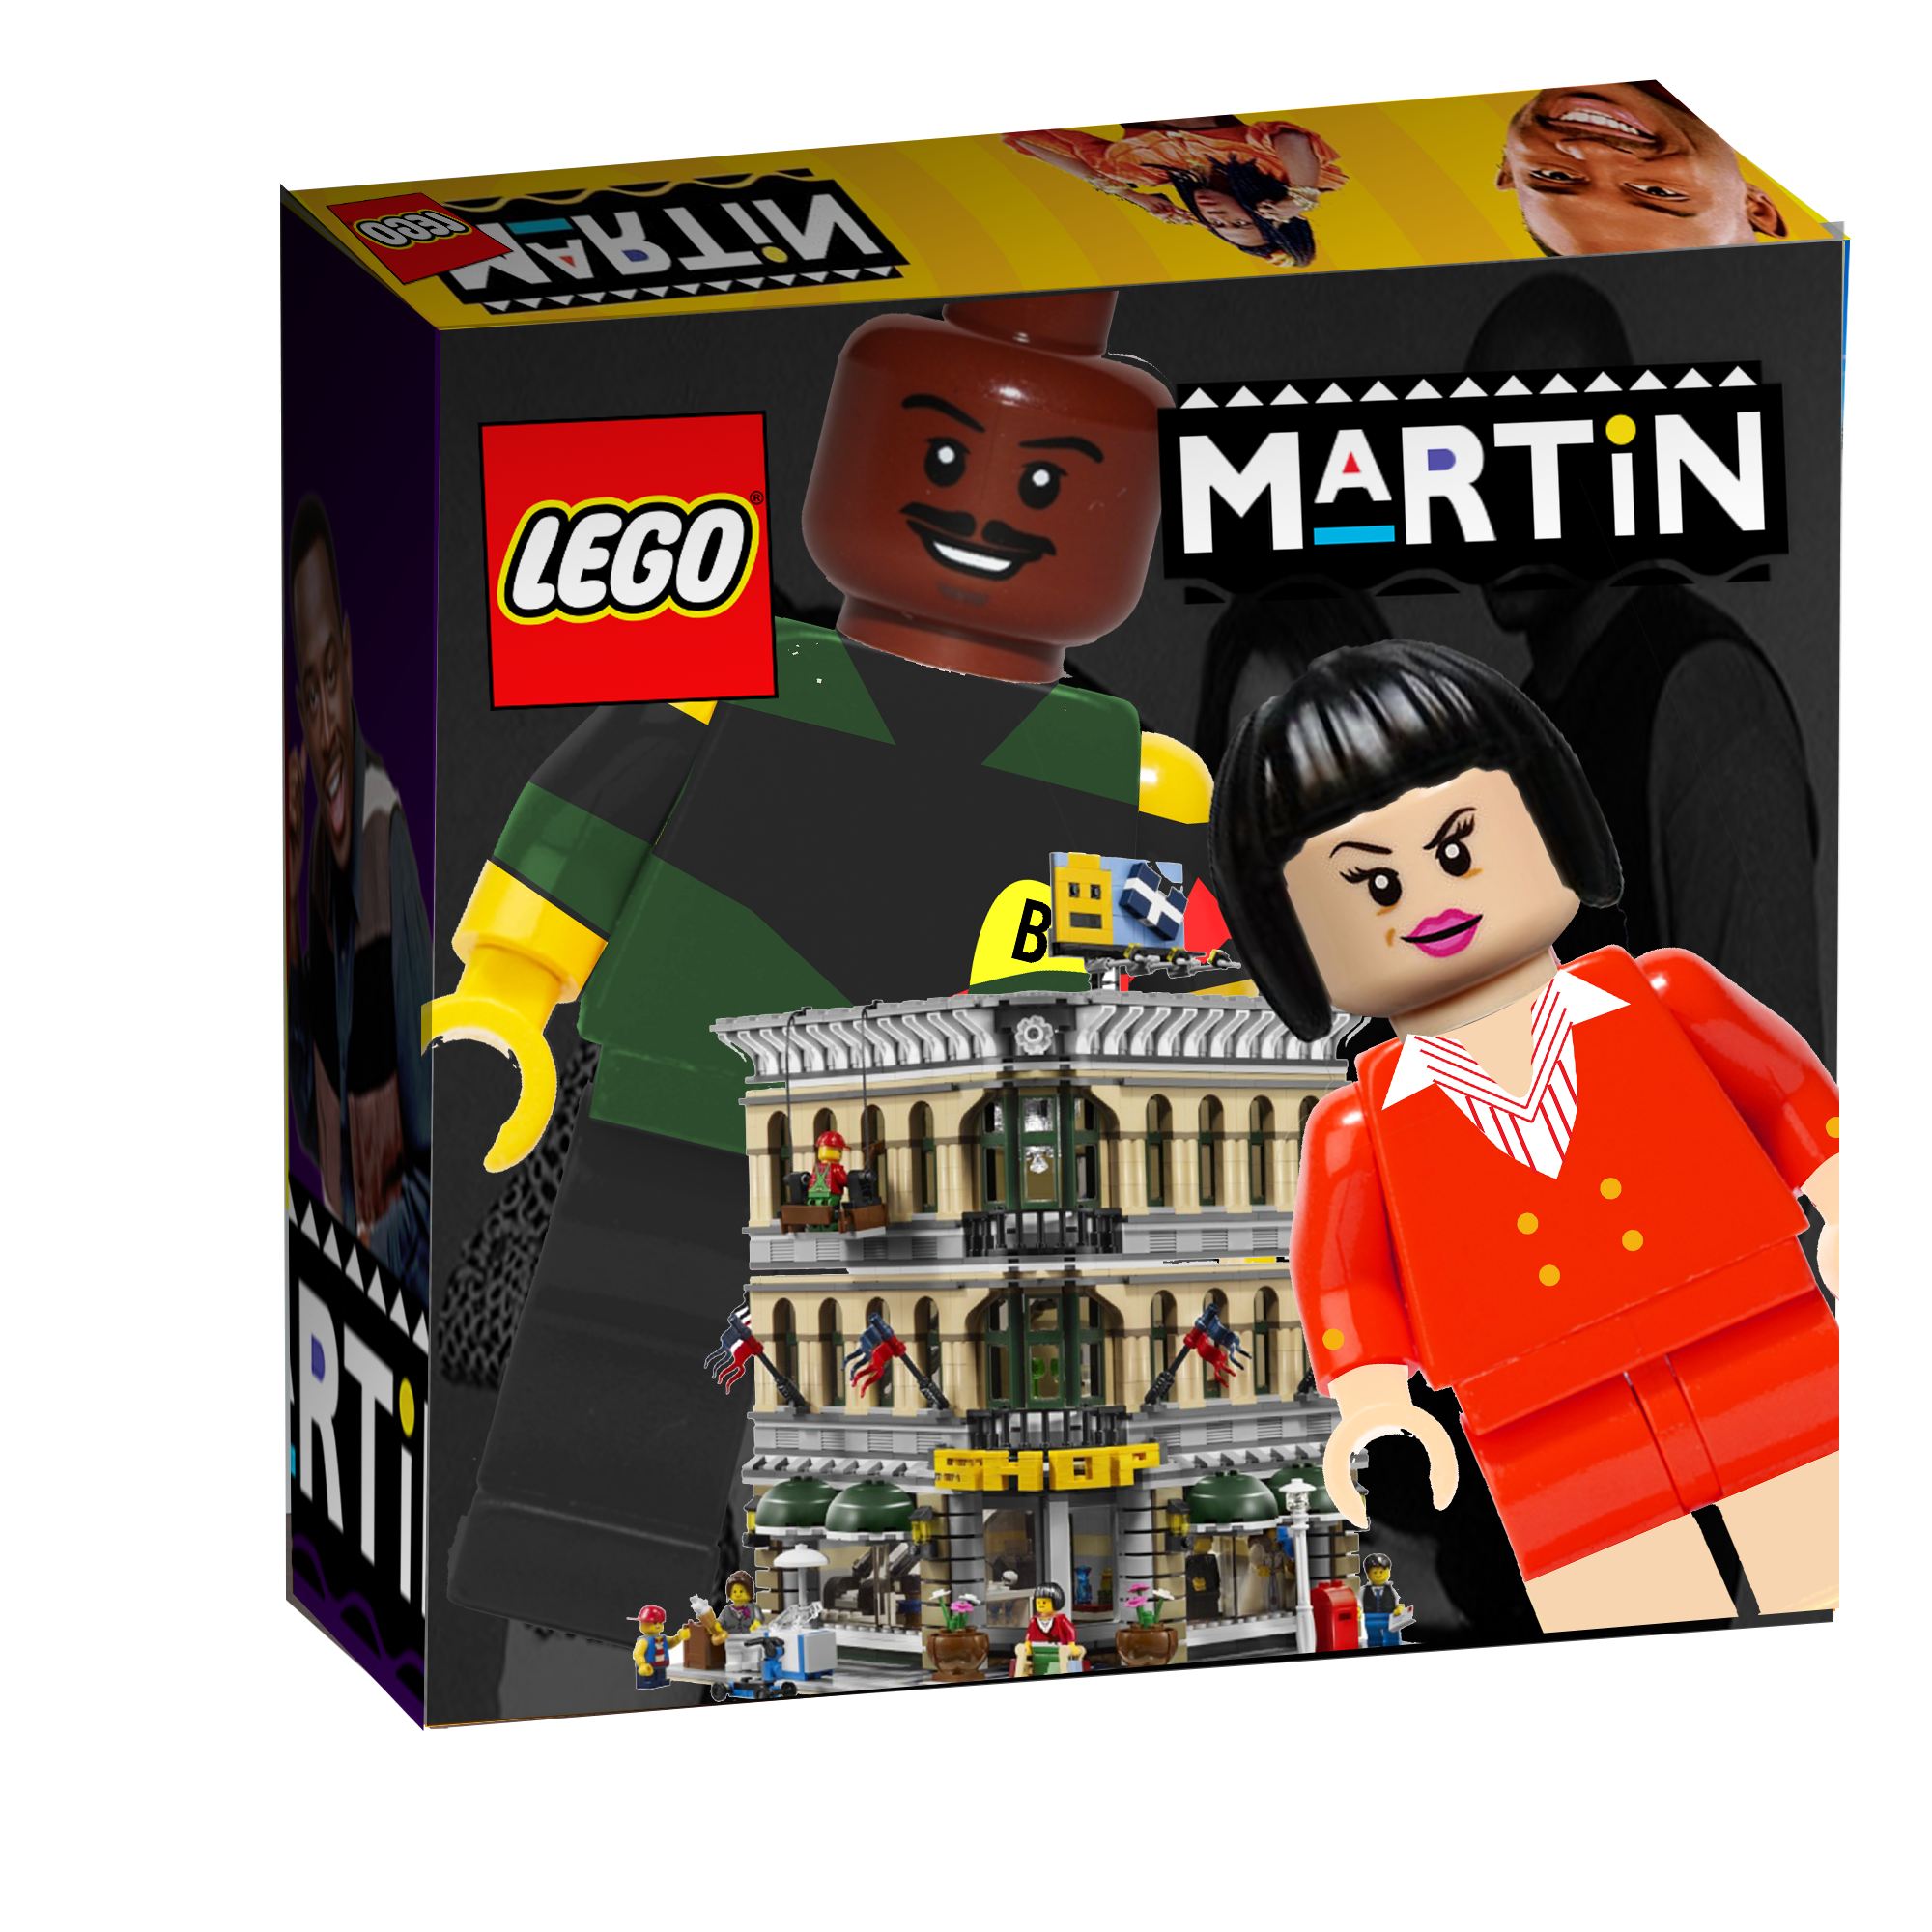 Martin Lego Box.png